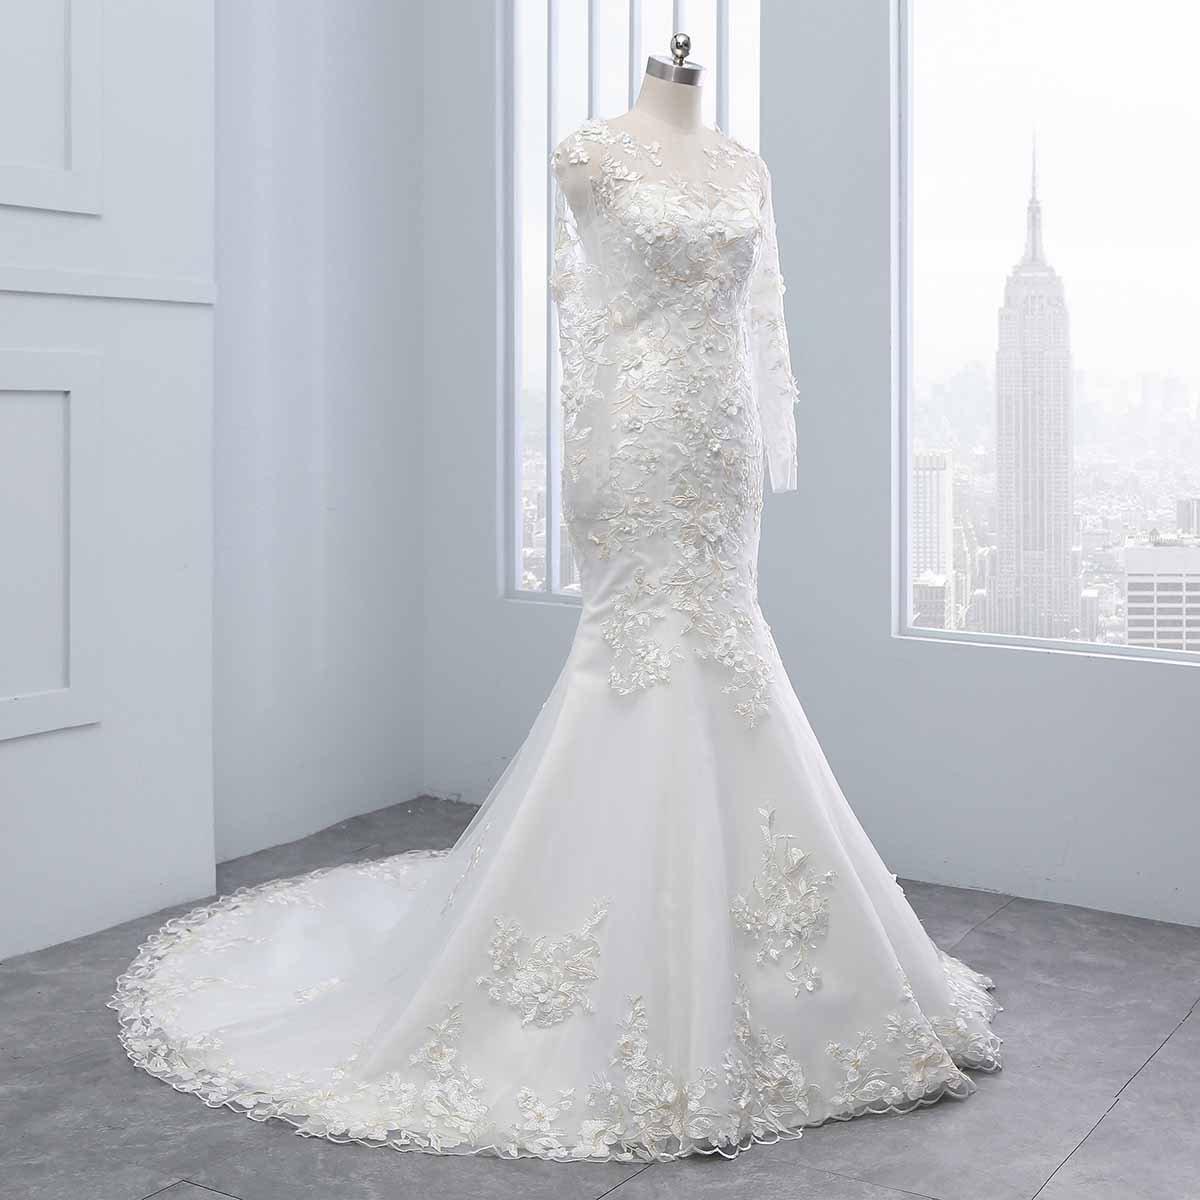 Yinyinhs Women\'s Jewel Mermaid Wedding Dresses Lace Appliques Chapel ...